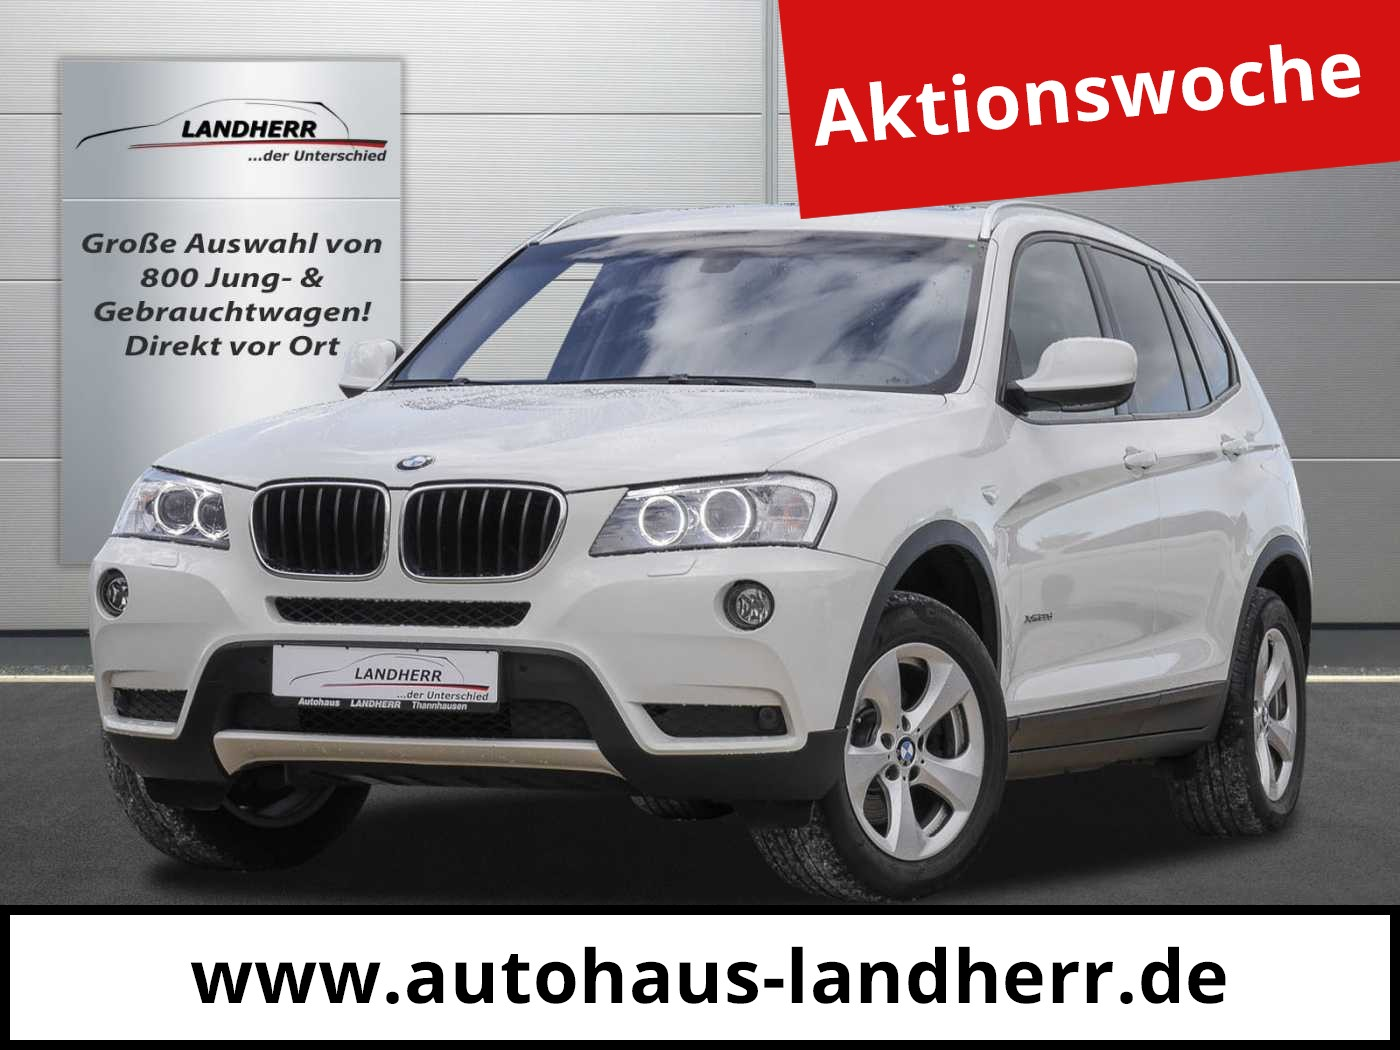 BMW X3 xDrive20d Aut. 1. Hand / Pano / AHK, Jahr 2013, Diesel